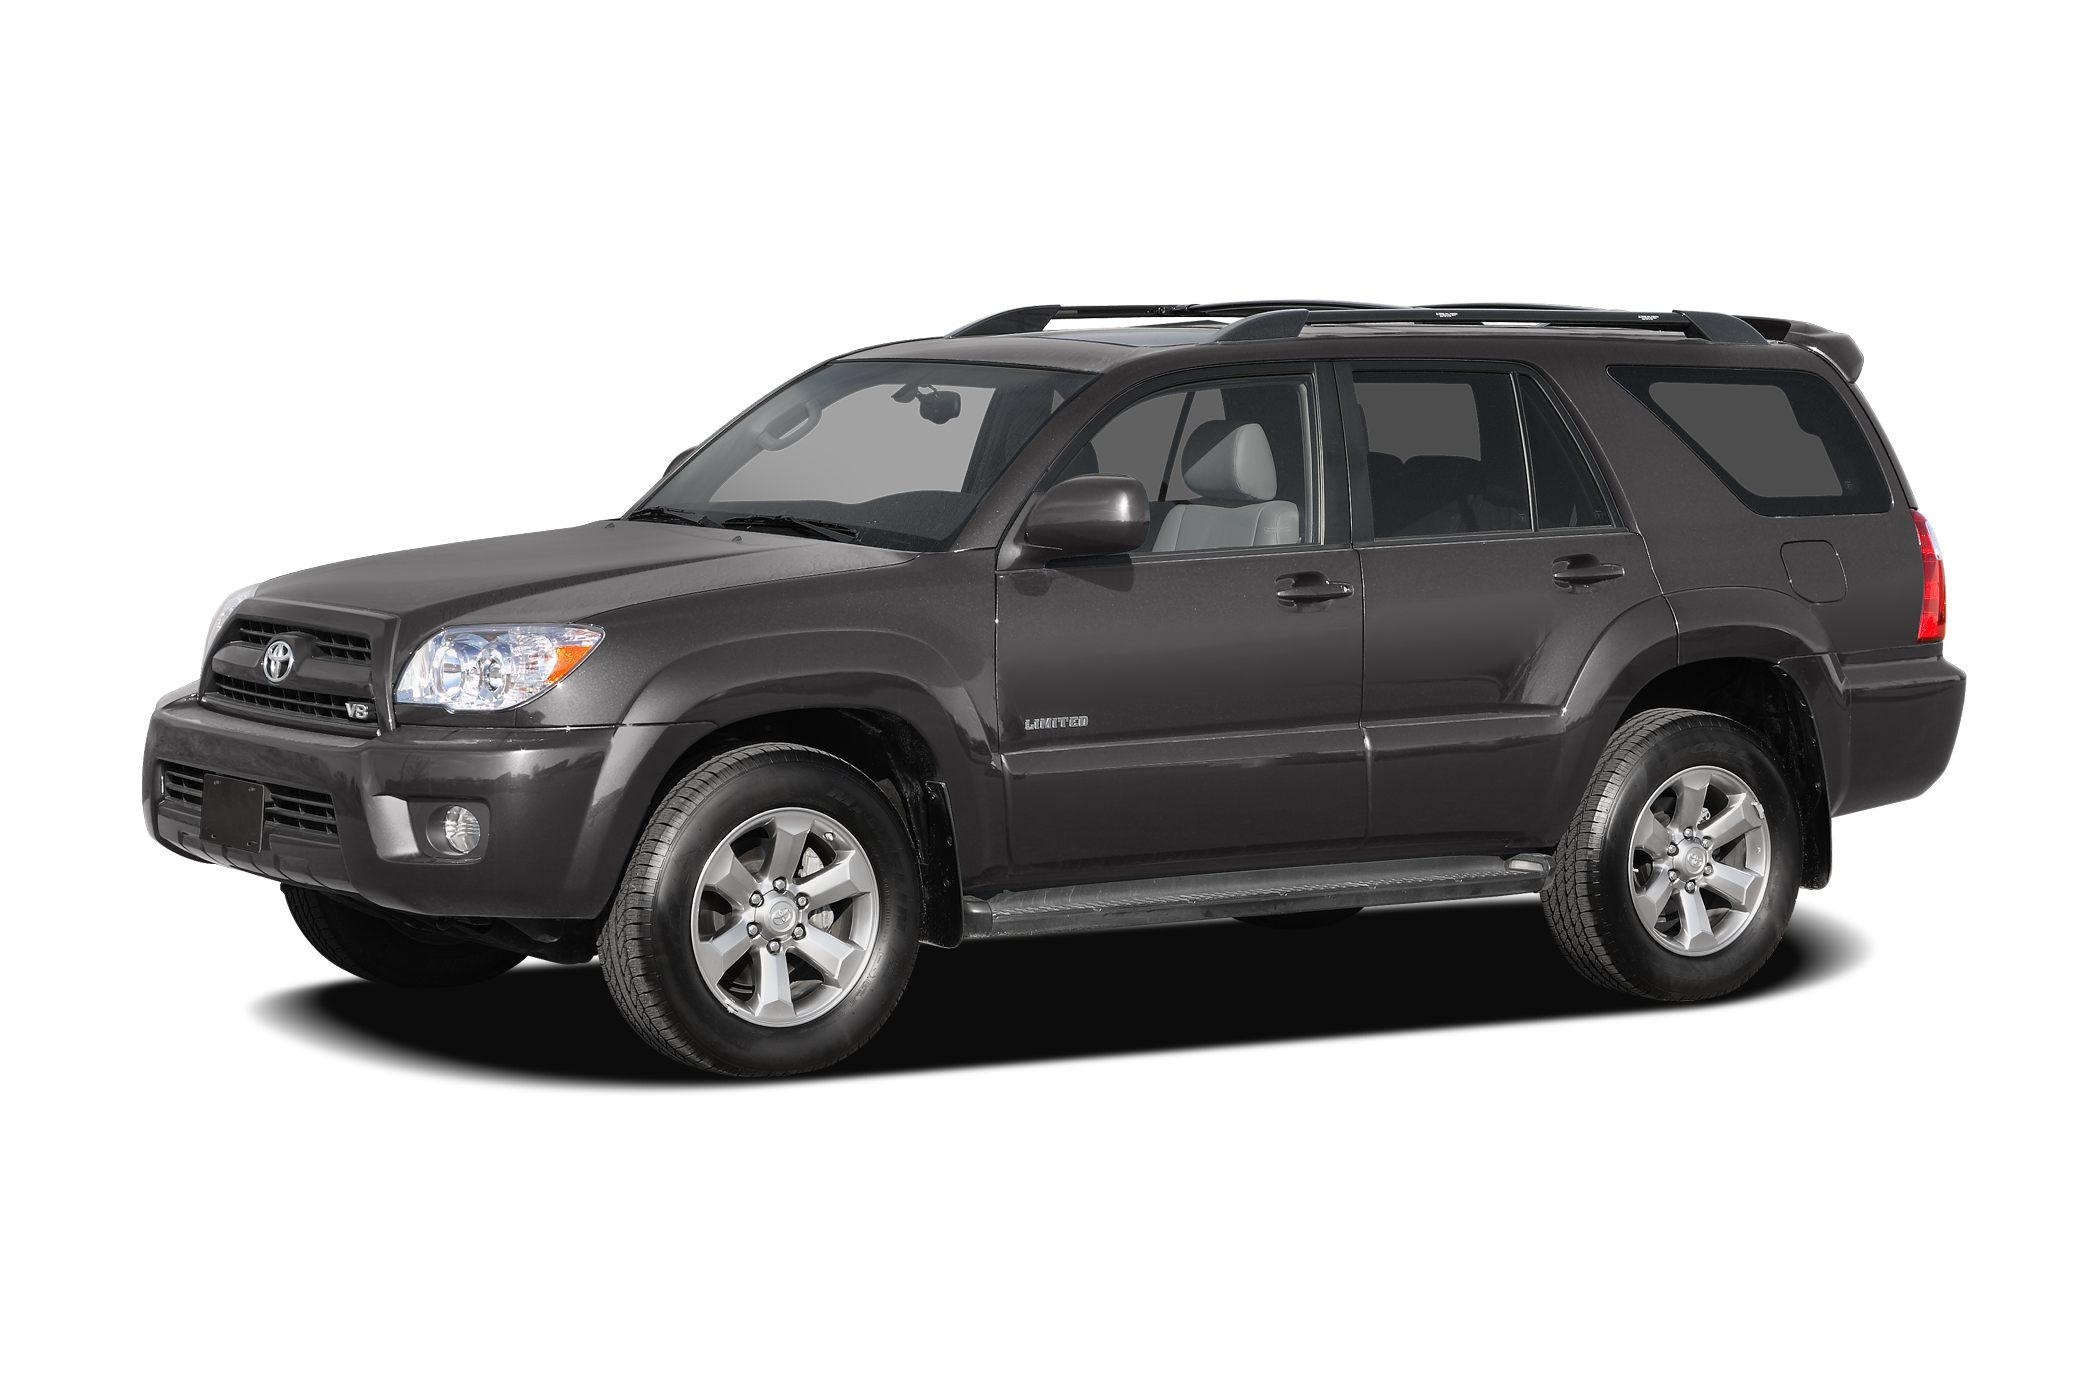 2006 Toyota 4Runner  Miles 92337Color Gray Stock T25750A VIN JTEBU14R560095817